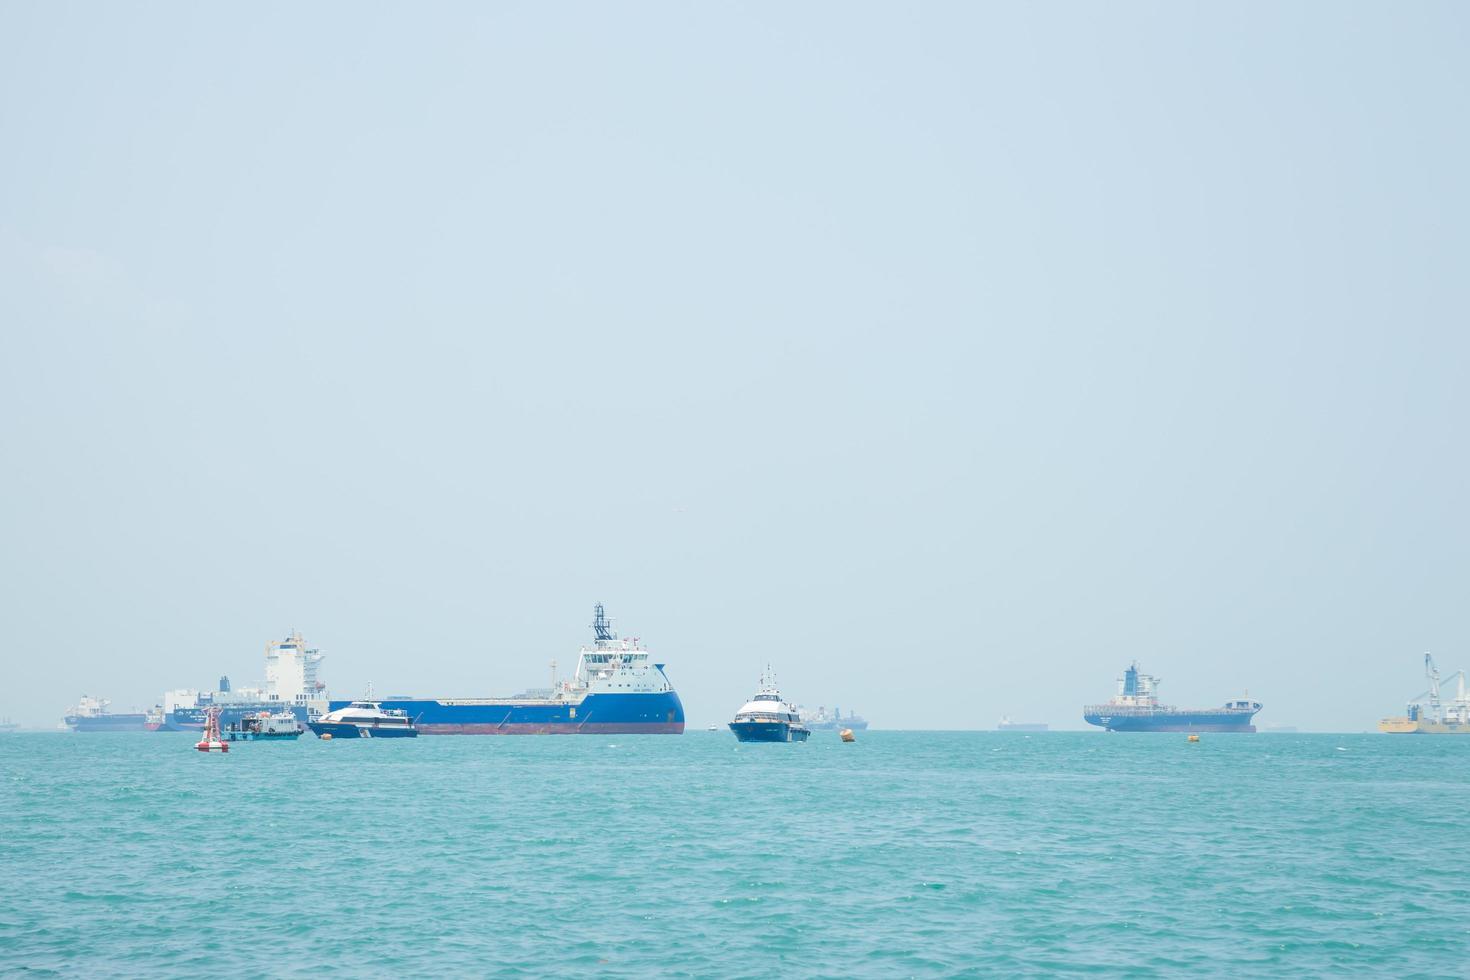 grandes buques de carga en el mar foto